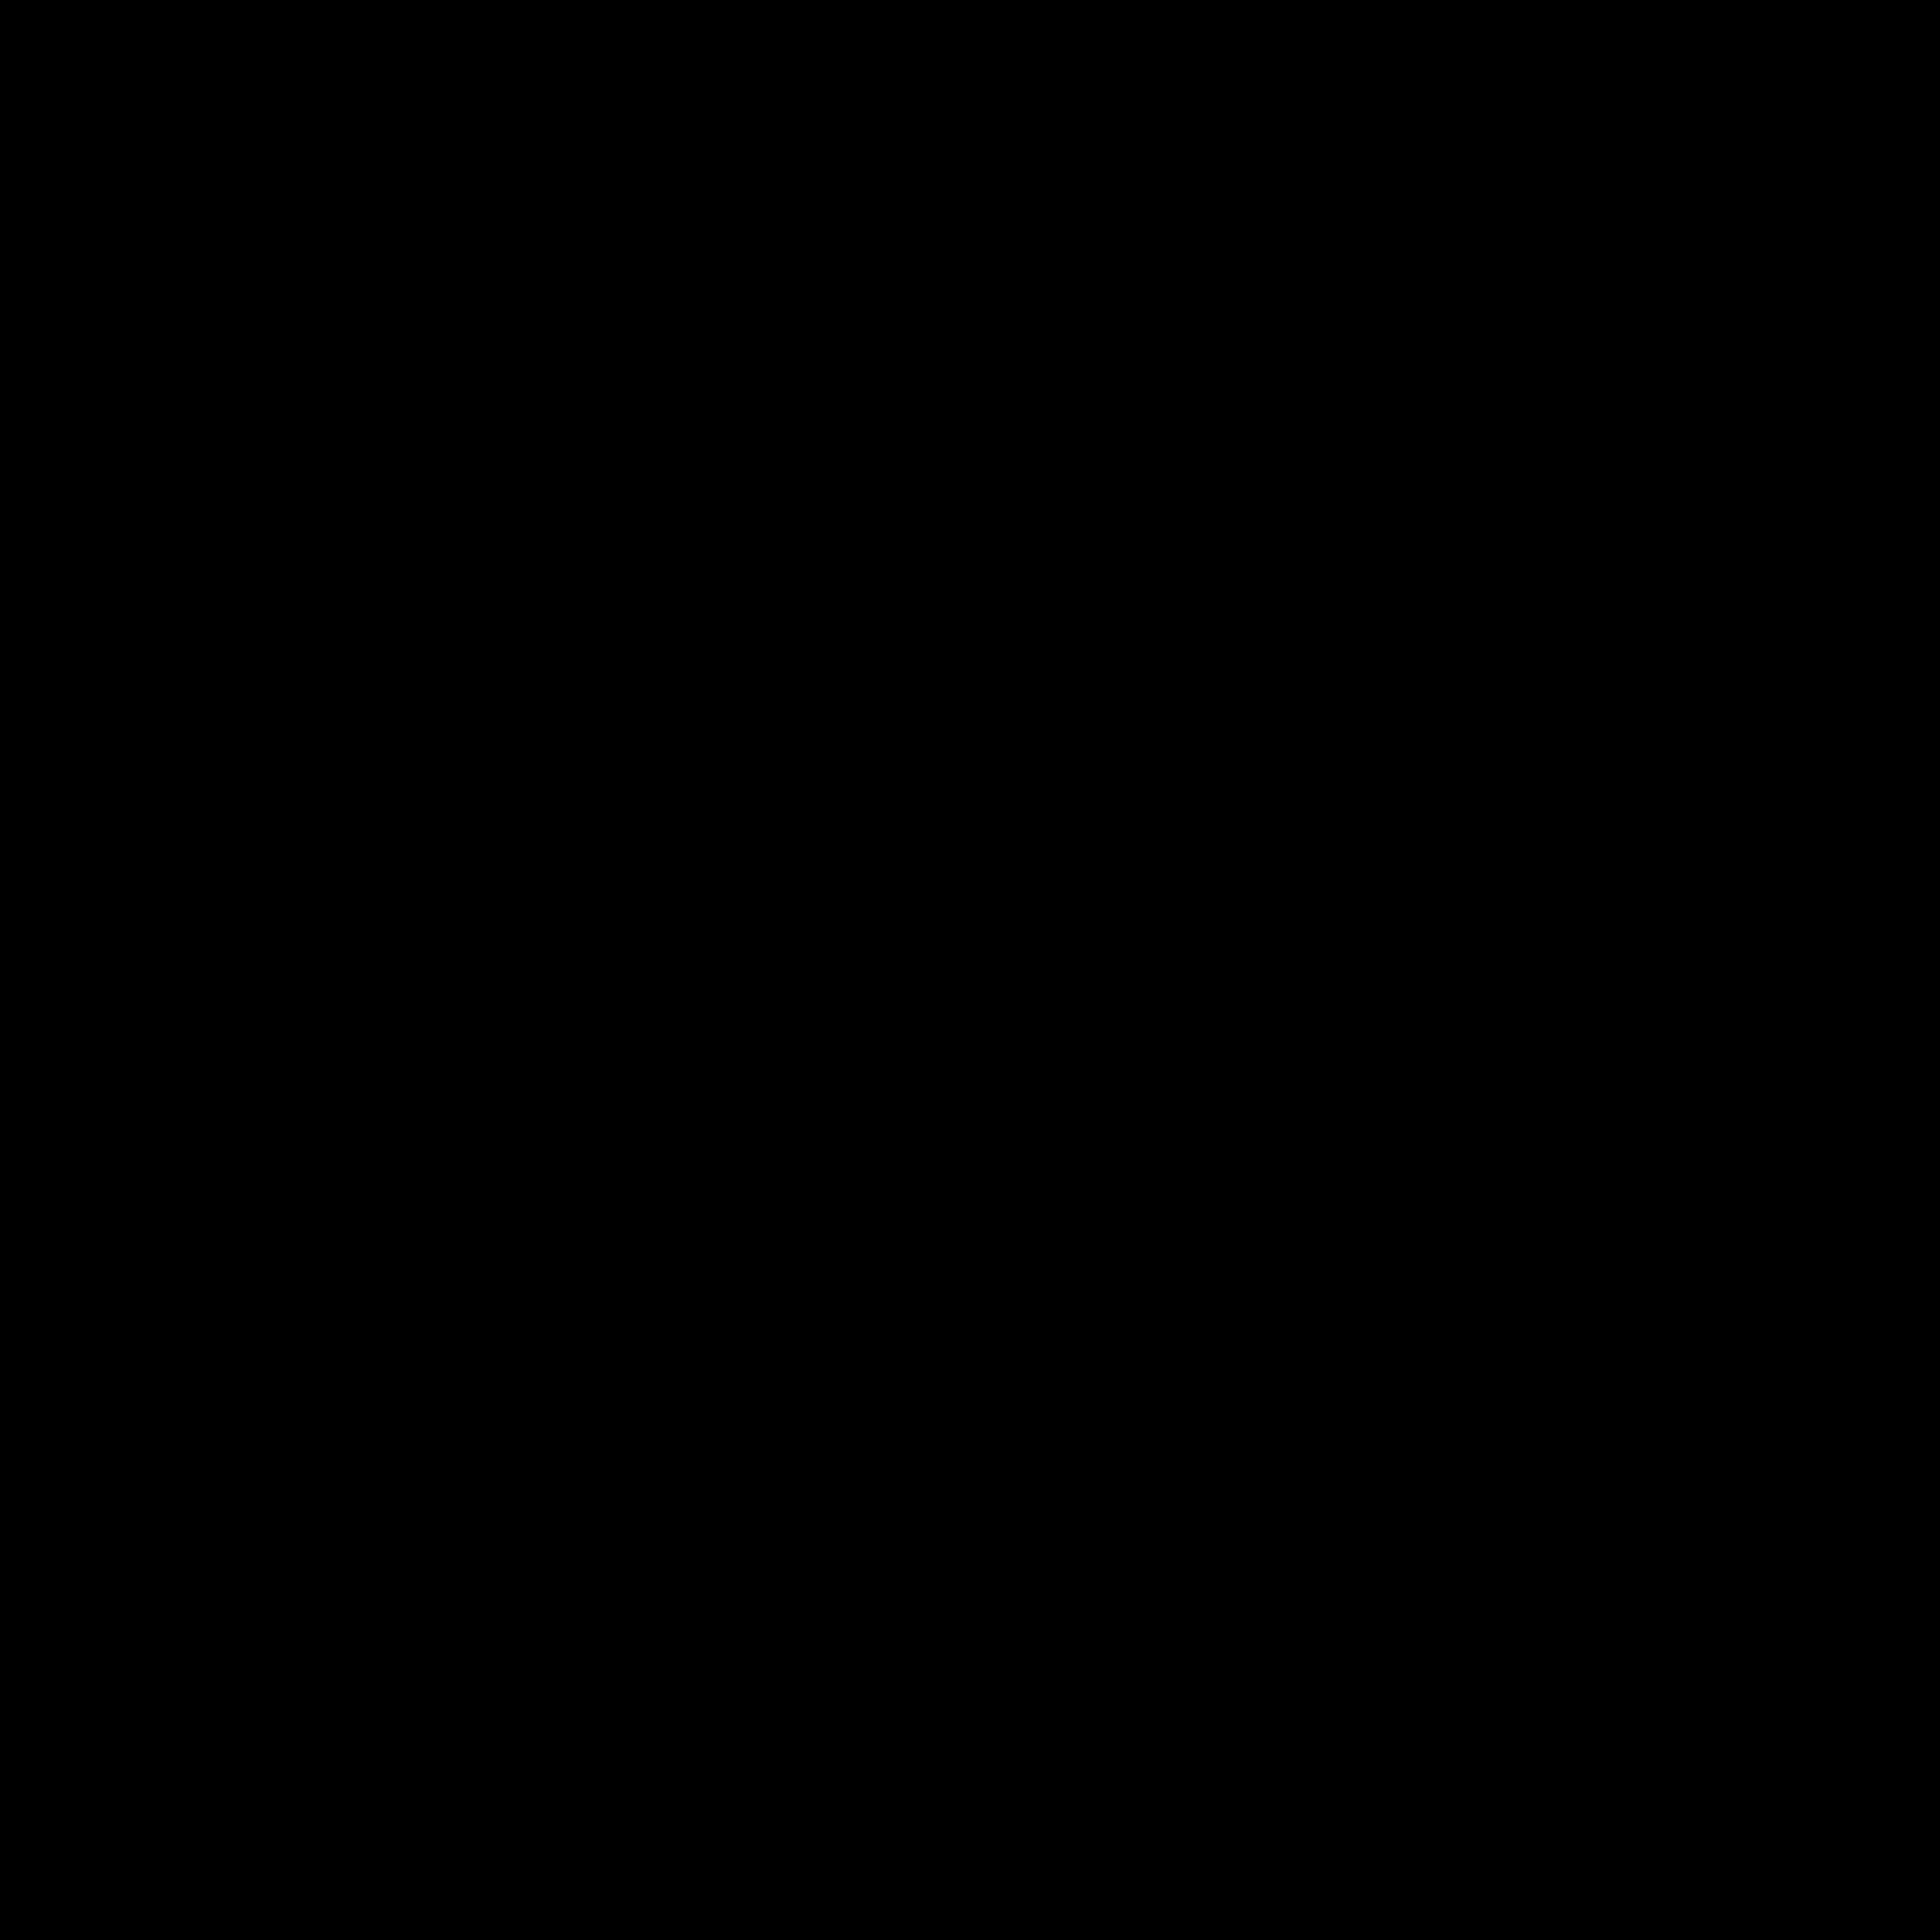 Johnson & Johnson Logo PNG Transparent & SVG Vector.